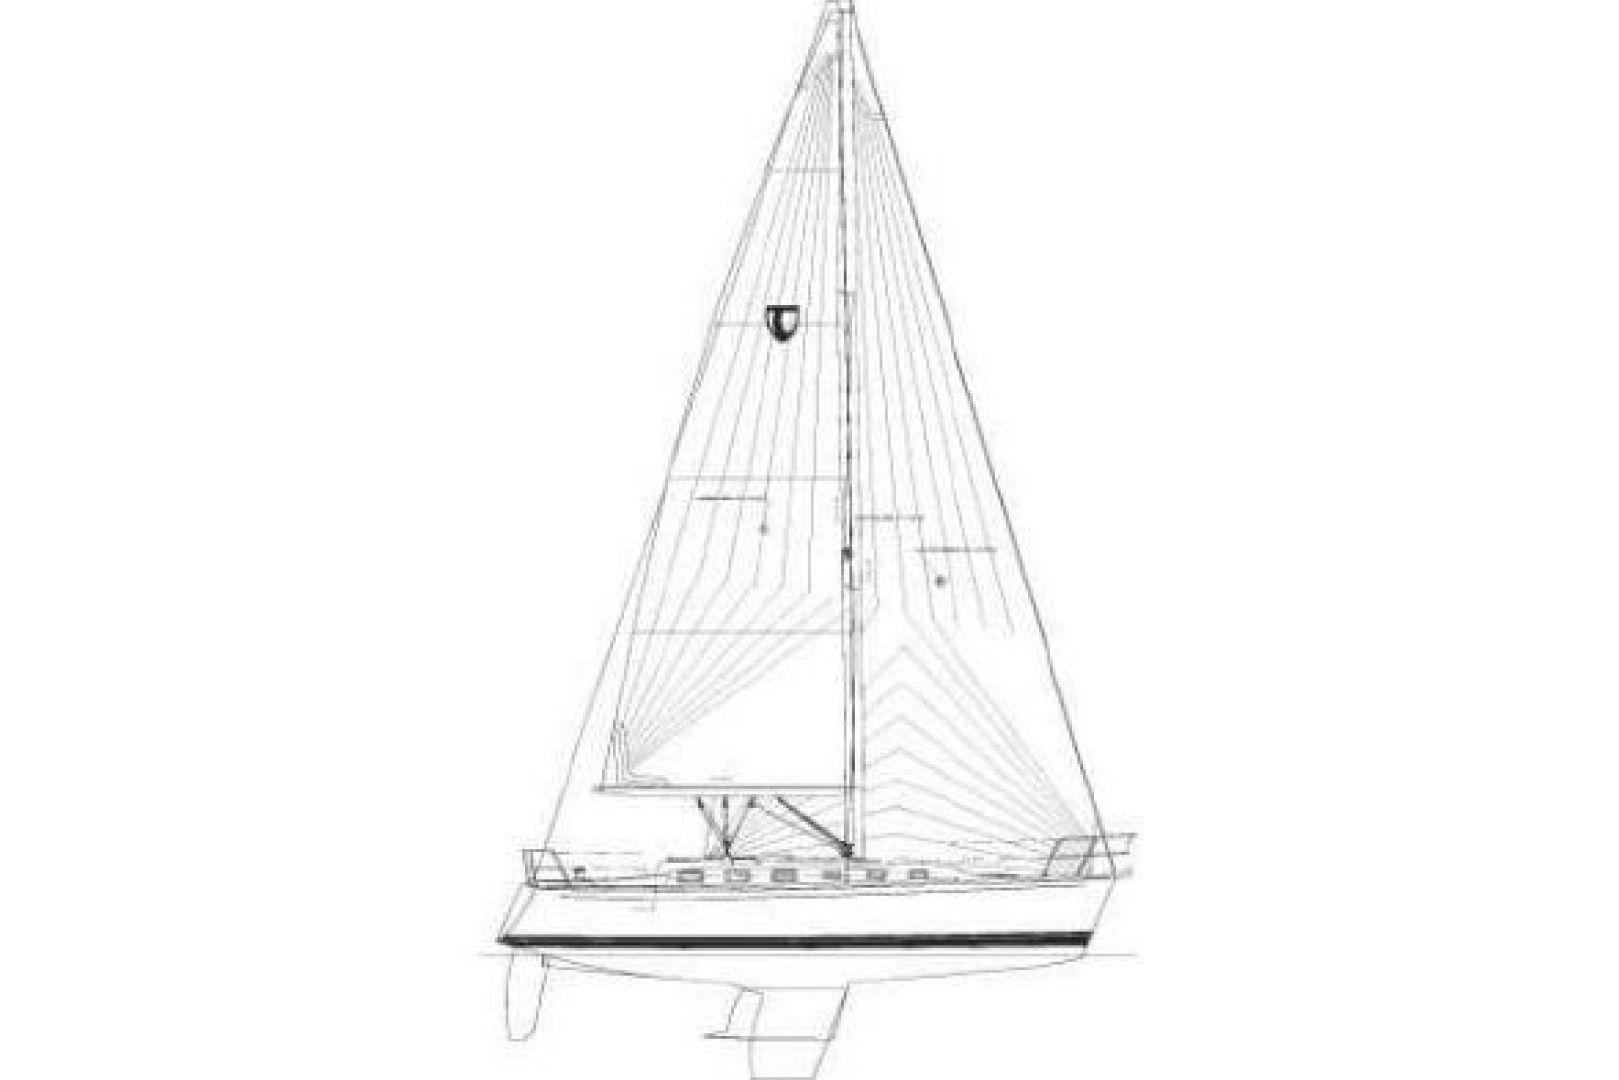 Tartan-3700 2001-Ikaika Anacortes-Washington-United States-1543599 | Thumbnail